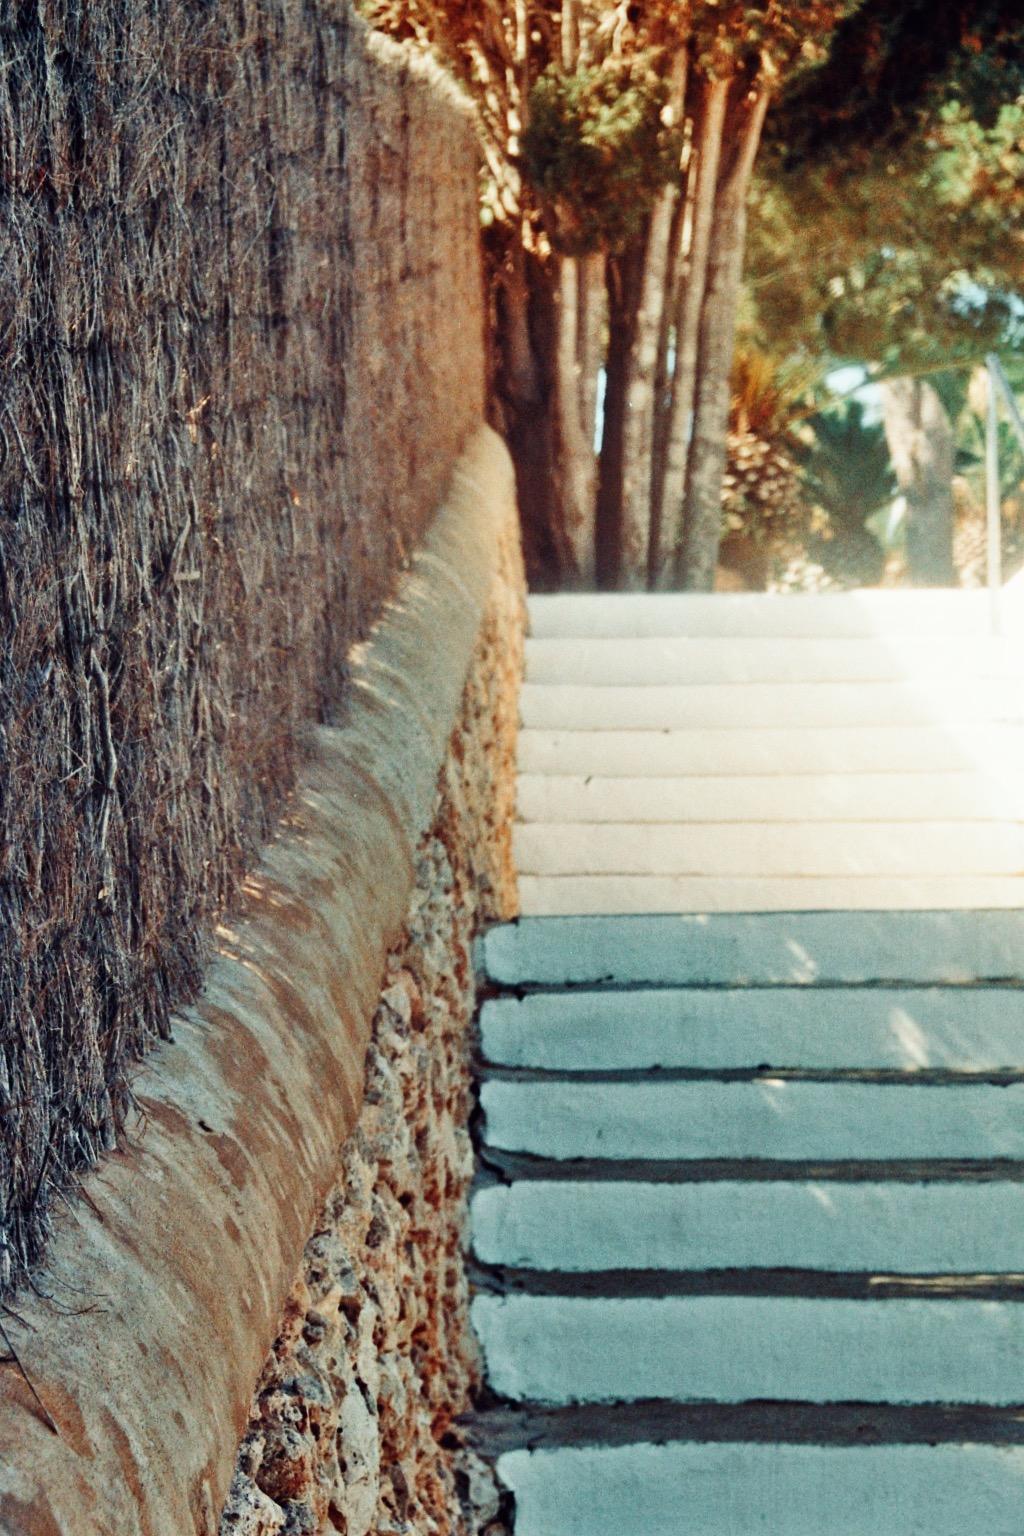 Ferienhaus Mallorca Treppen